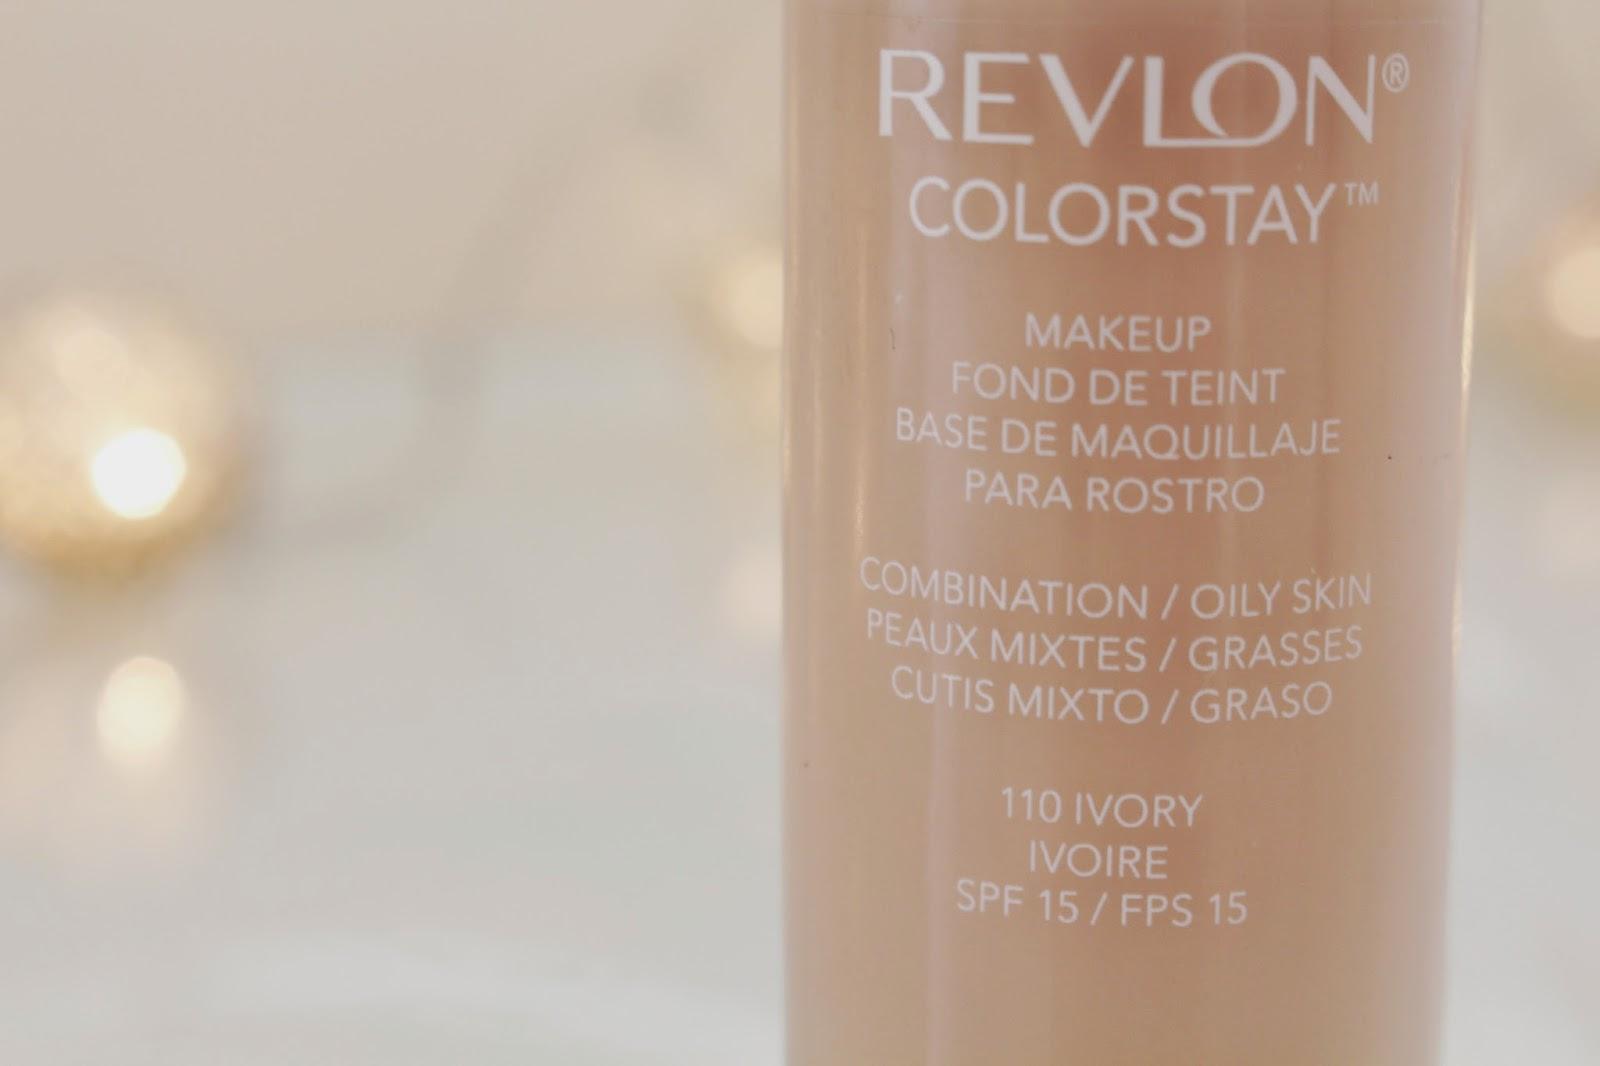 Đánh giá kem nền siêu che phủ Revlon Colorstay Foundation for Combination/ Oily skin